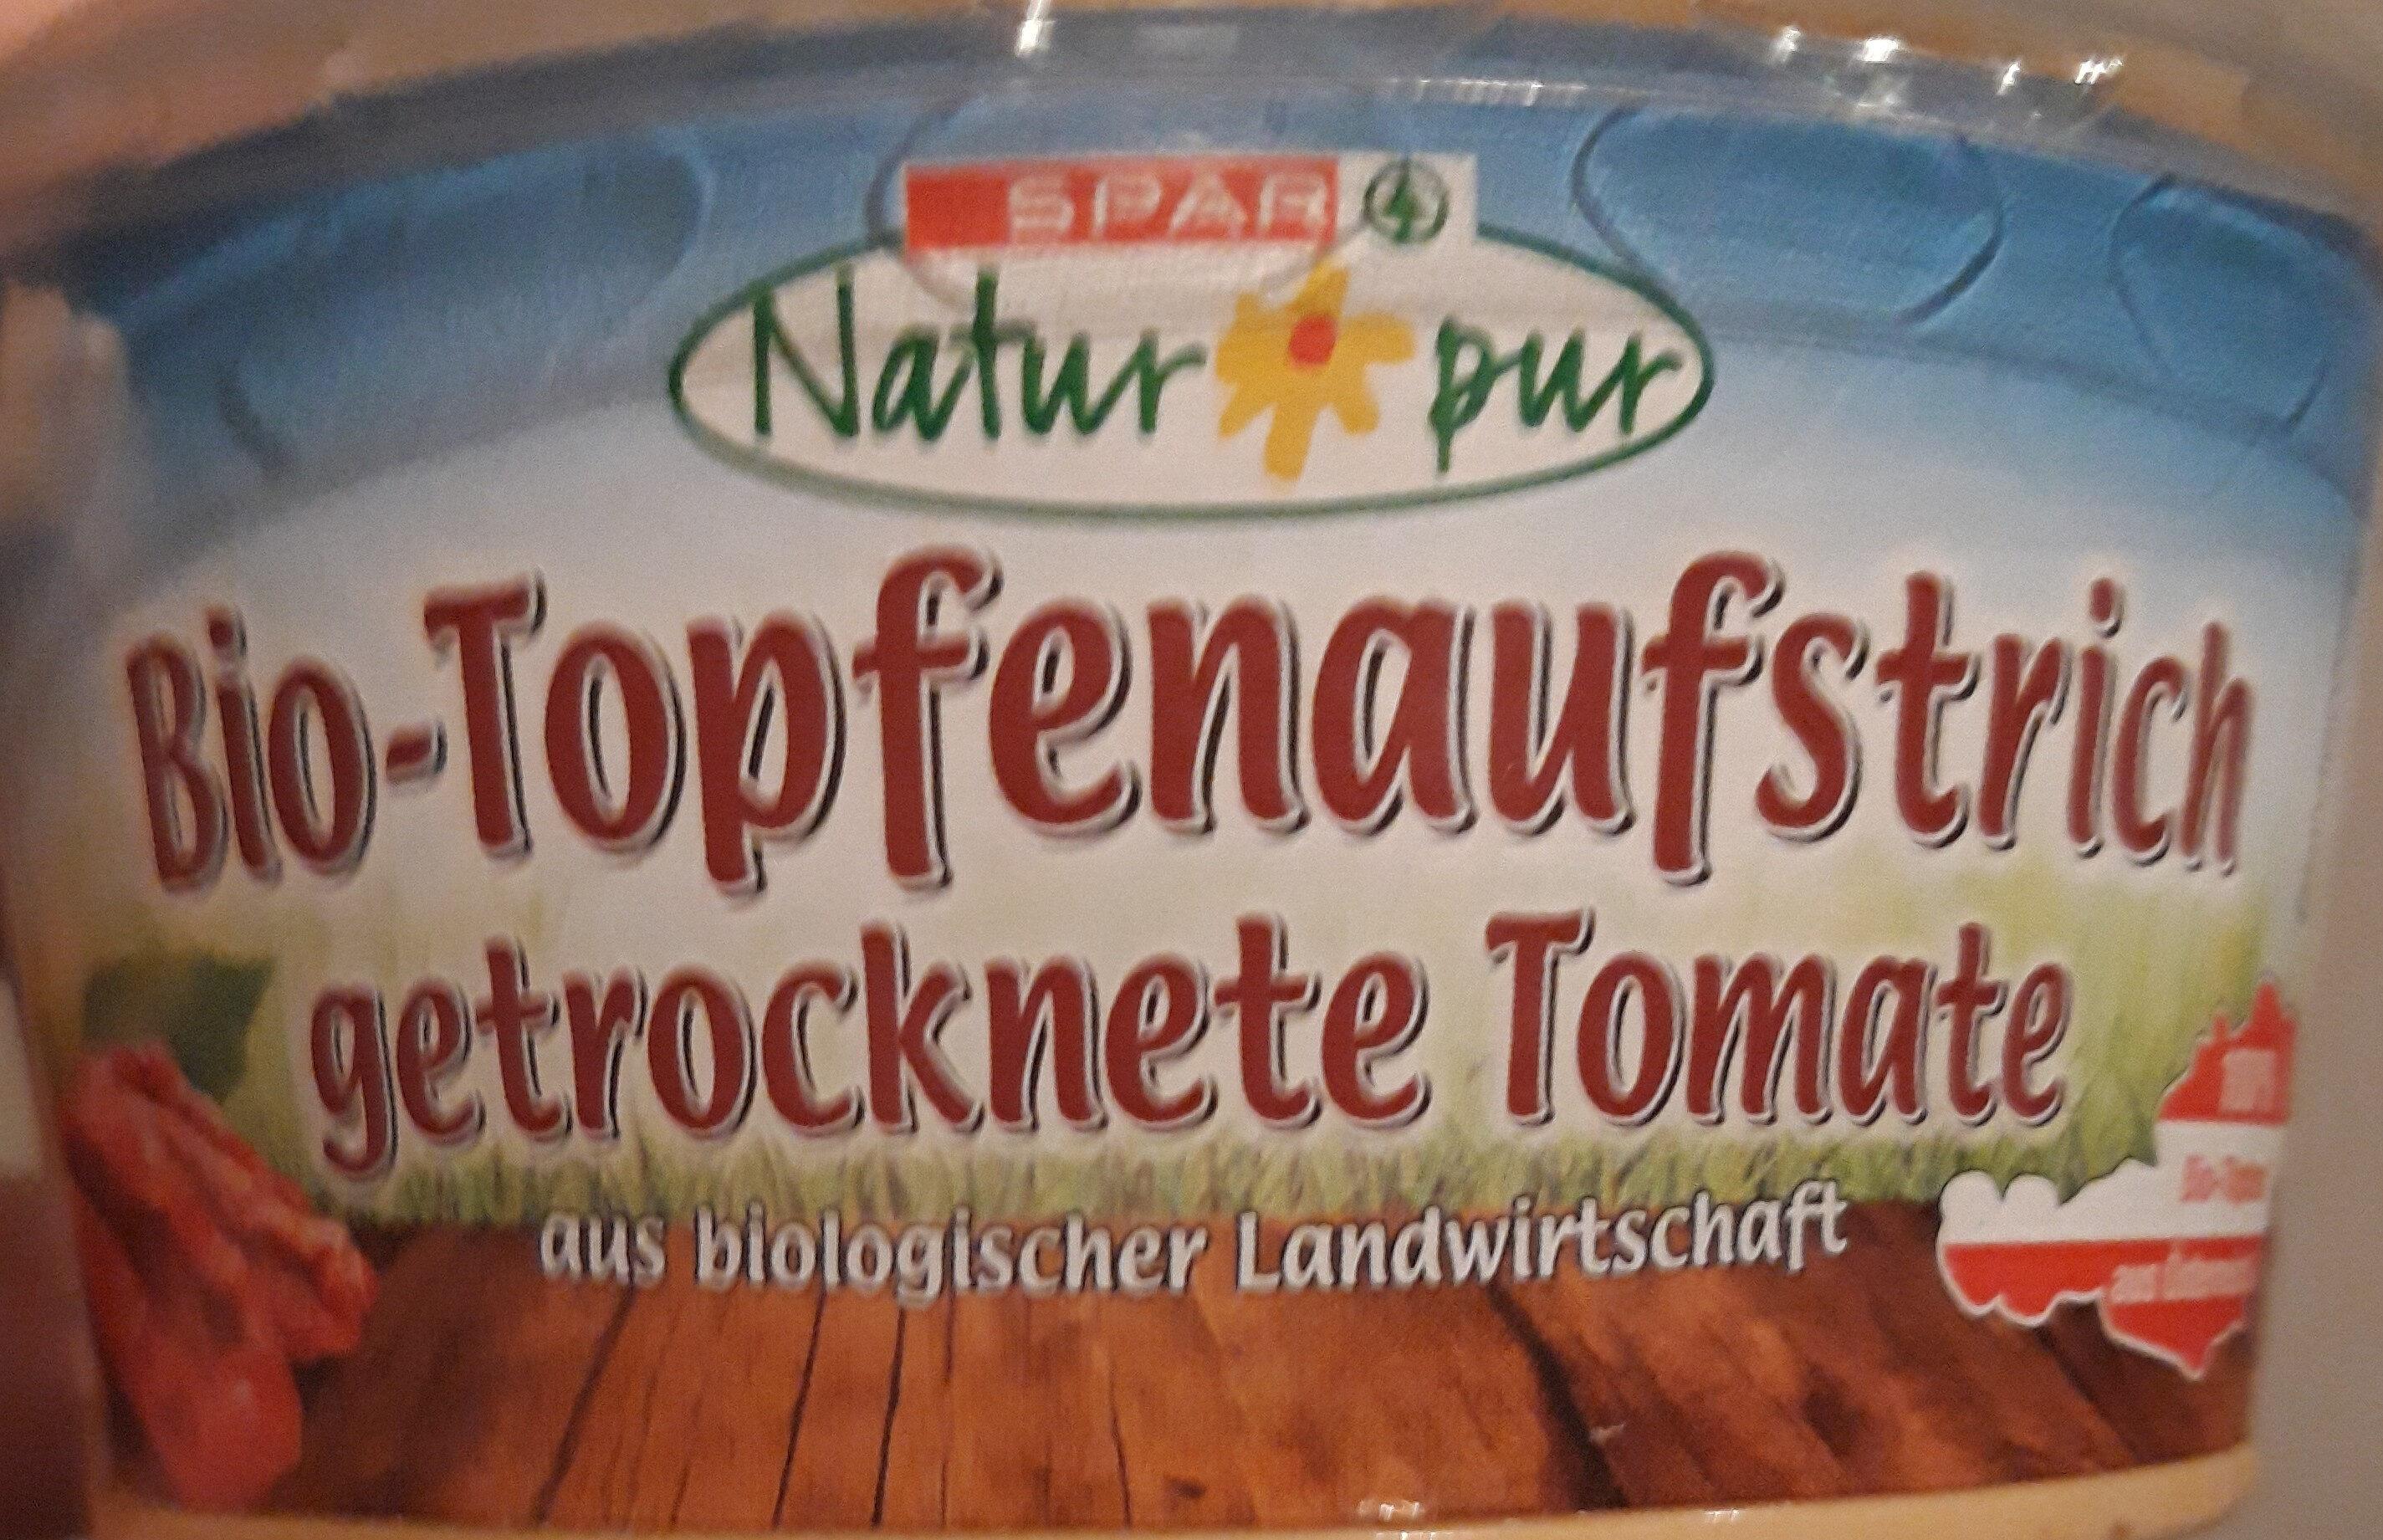 Bio-Topfenaufstrich getrocknete Tomate - Produit - de